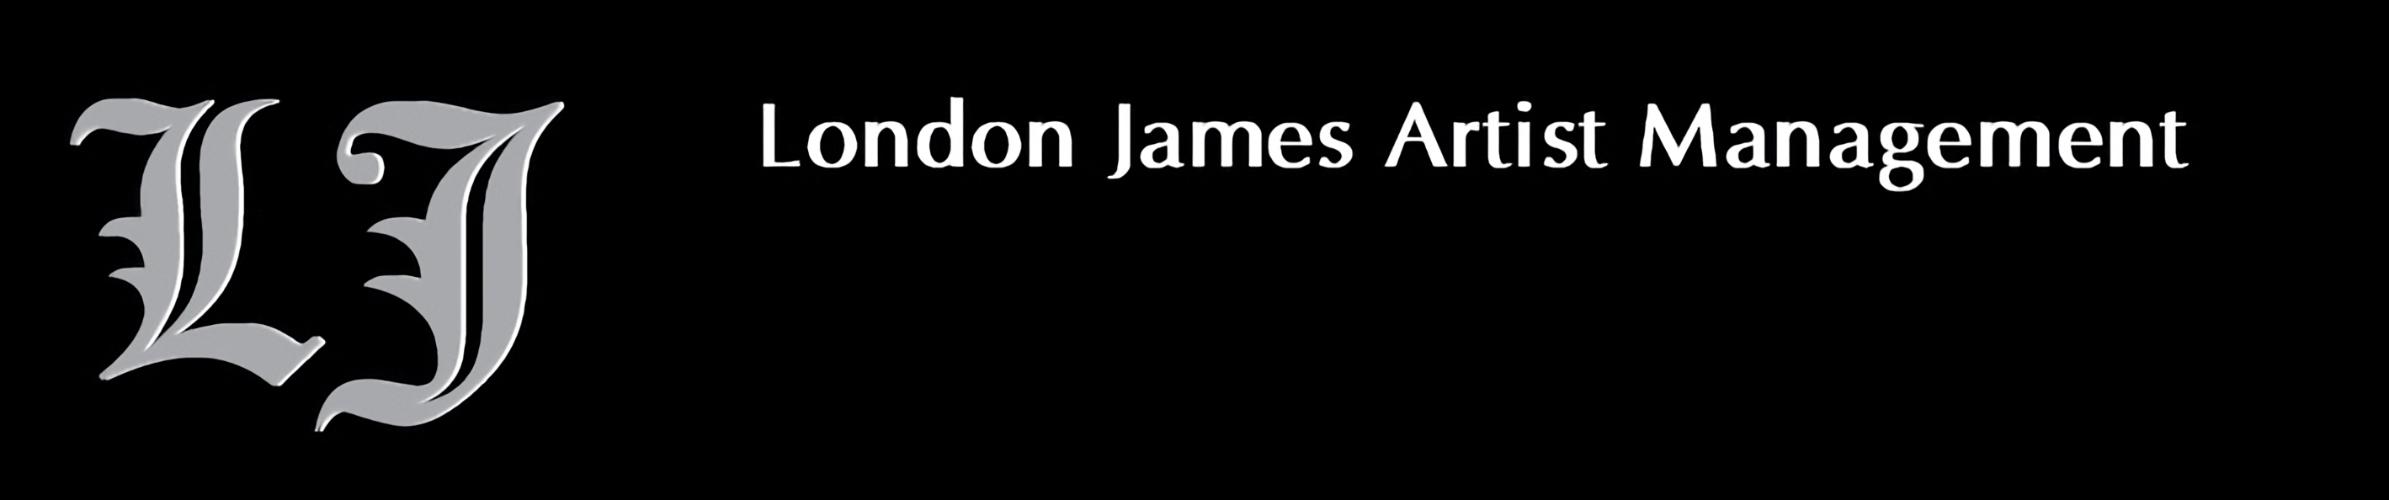 London James